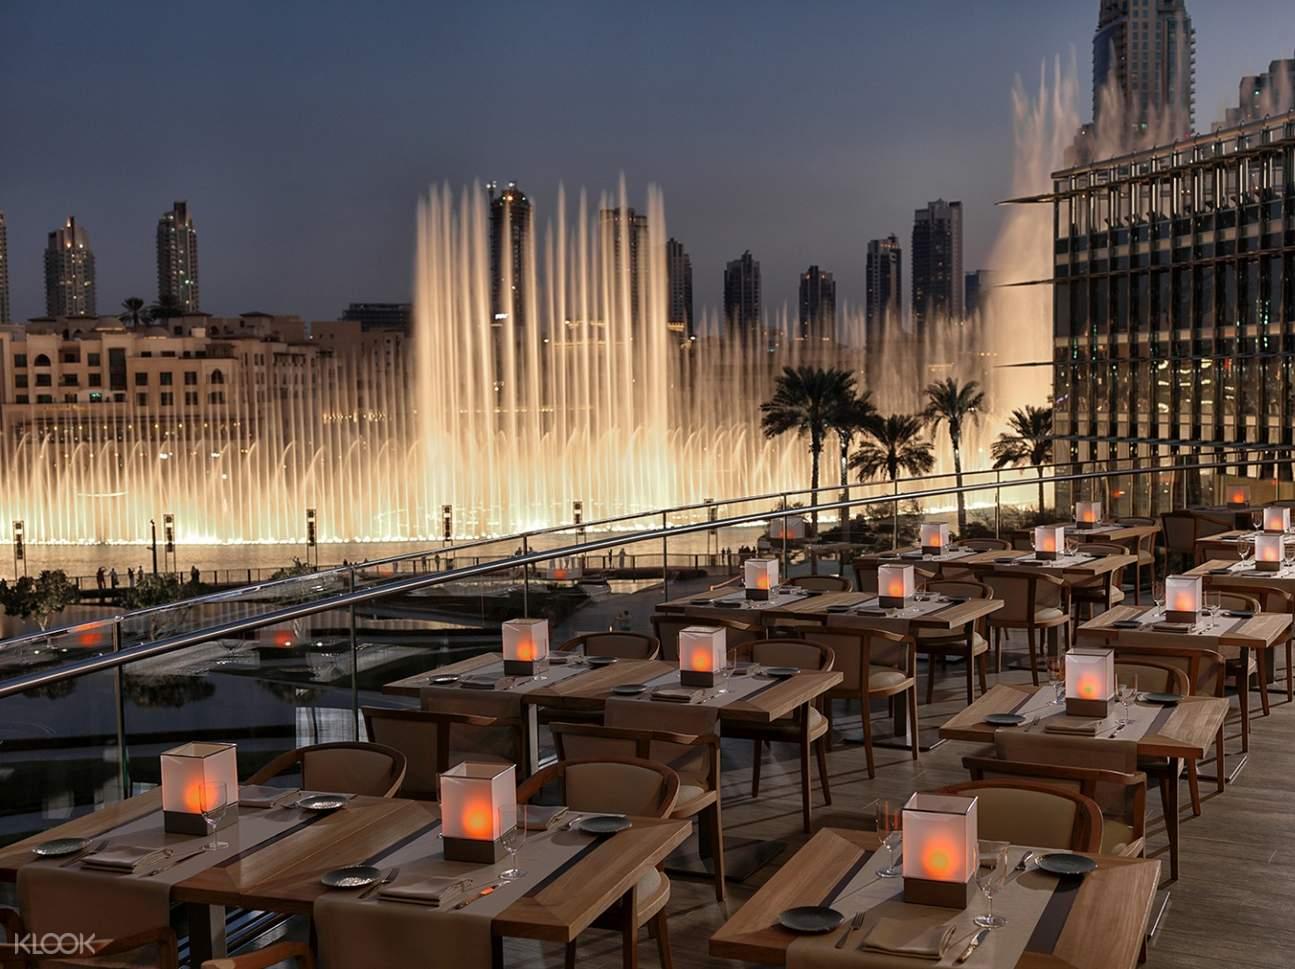 Afbeeldingsresultaat voor armani hotel buffet fountains dubai